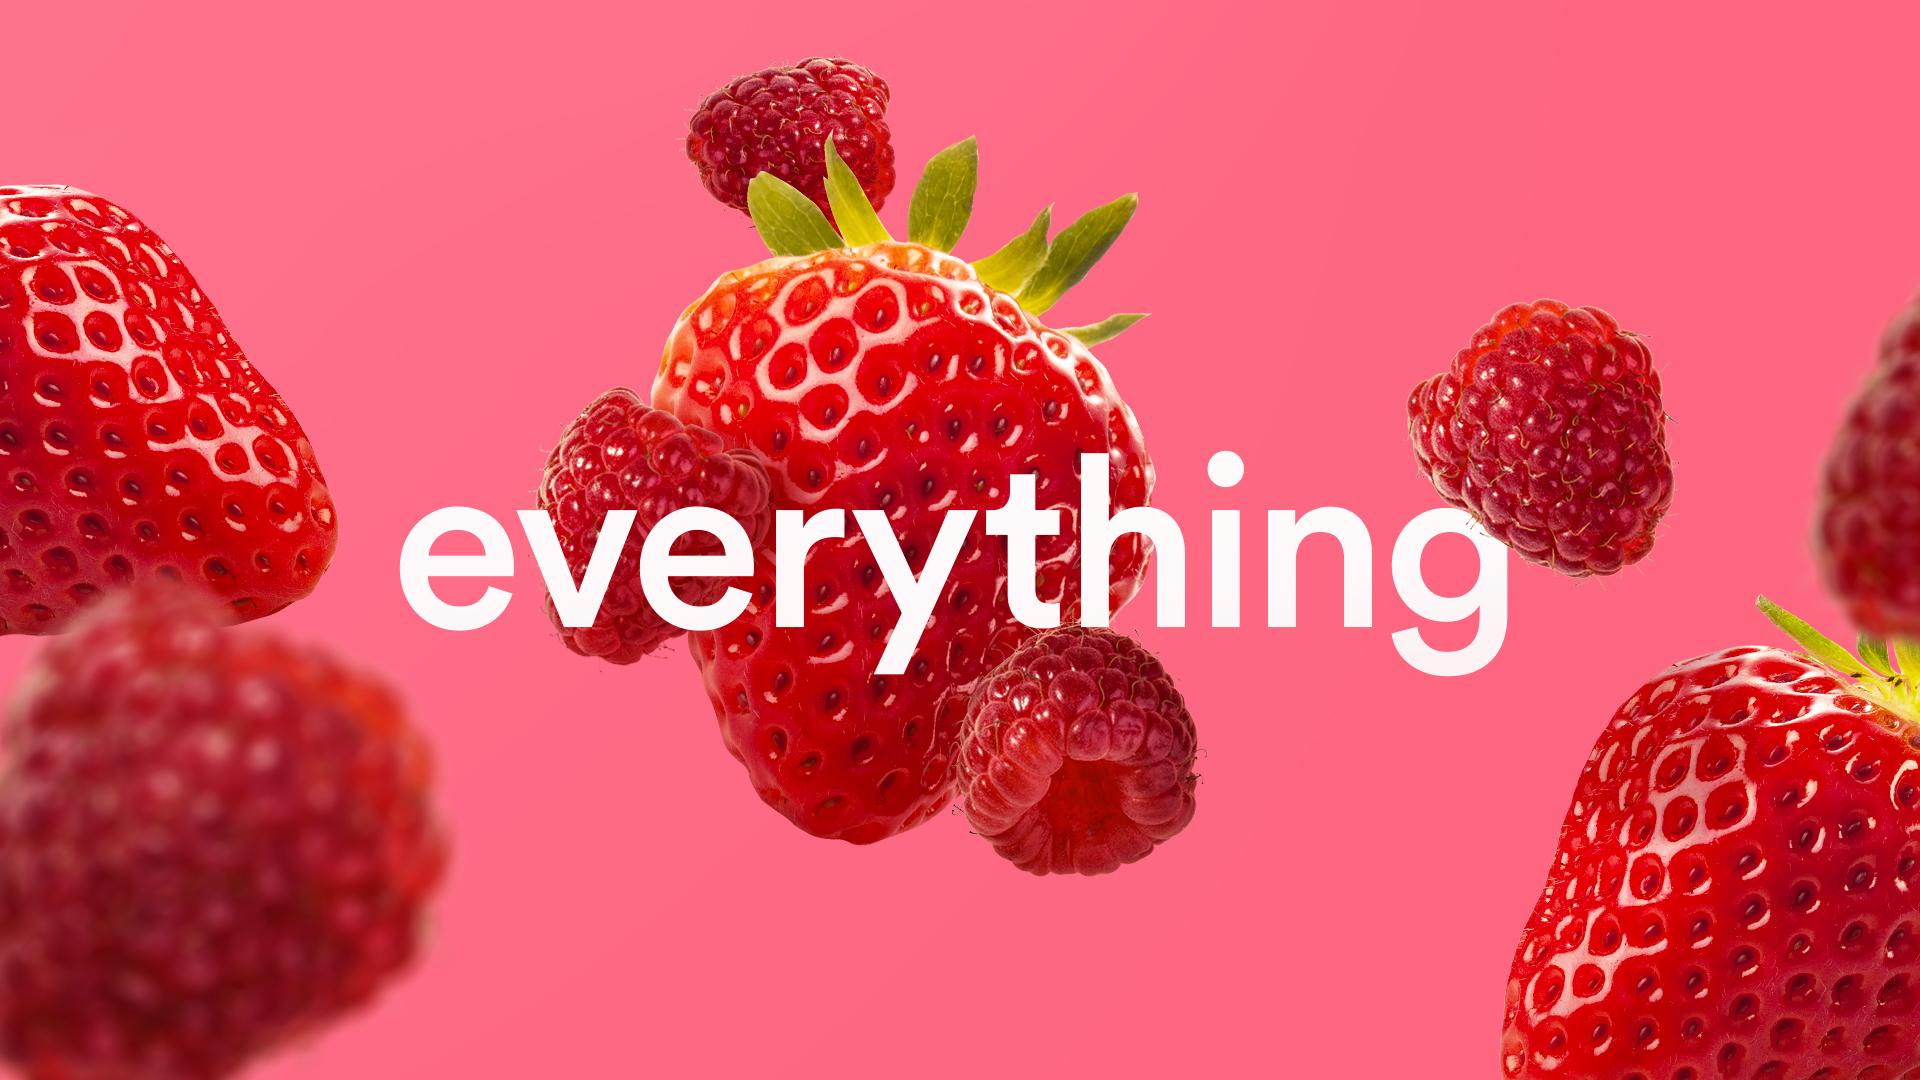 Rxbar_Strawberry_a01_v01b.jpg